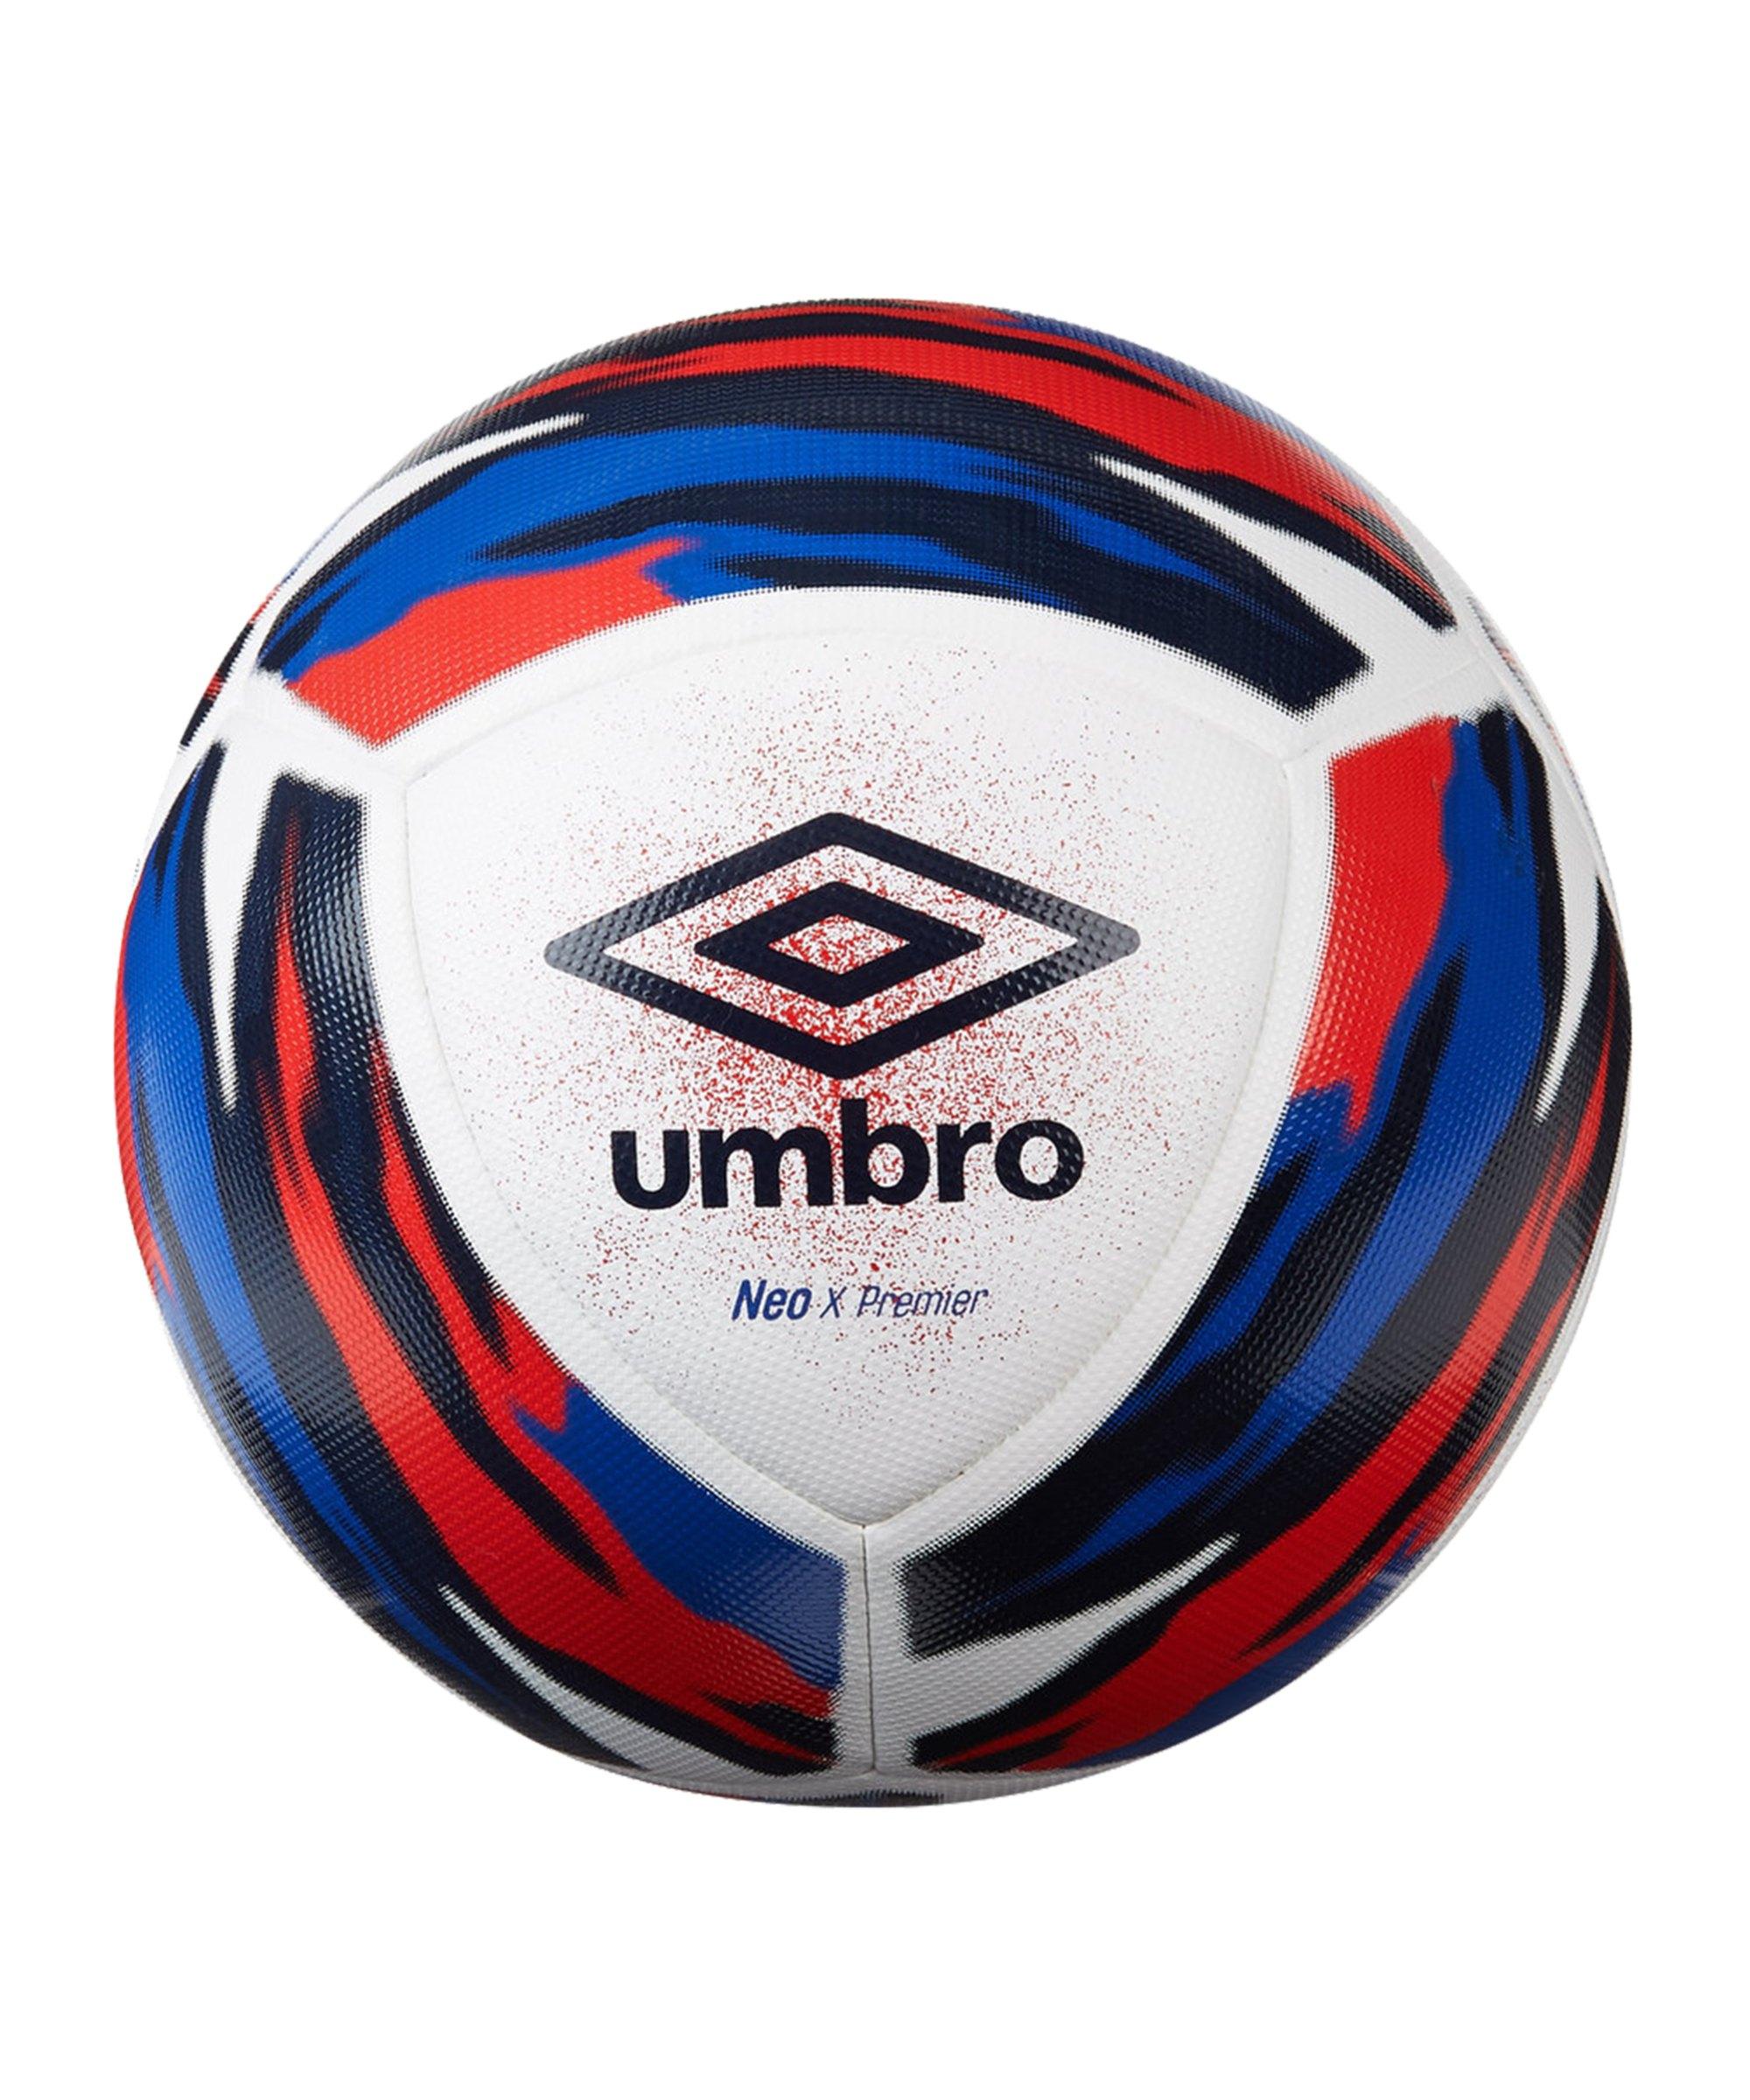 Umbro Neo X Premier Trainingsball Weiss Blau FJPX - weiss